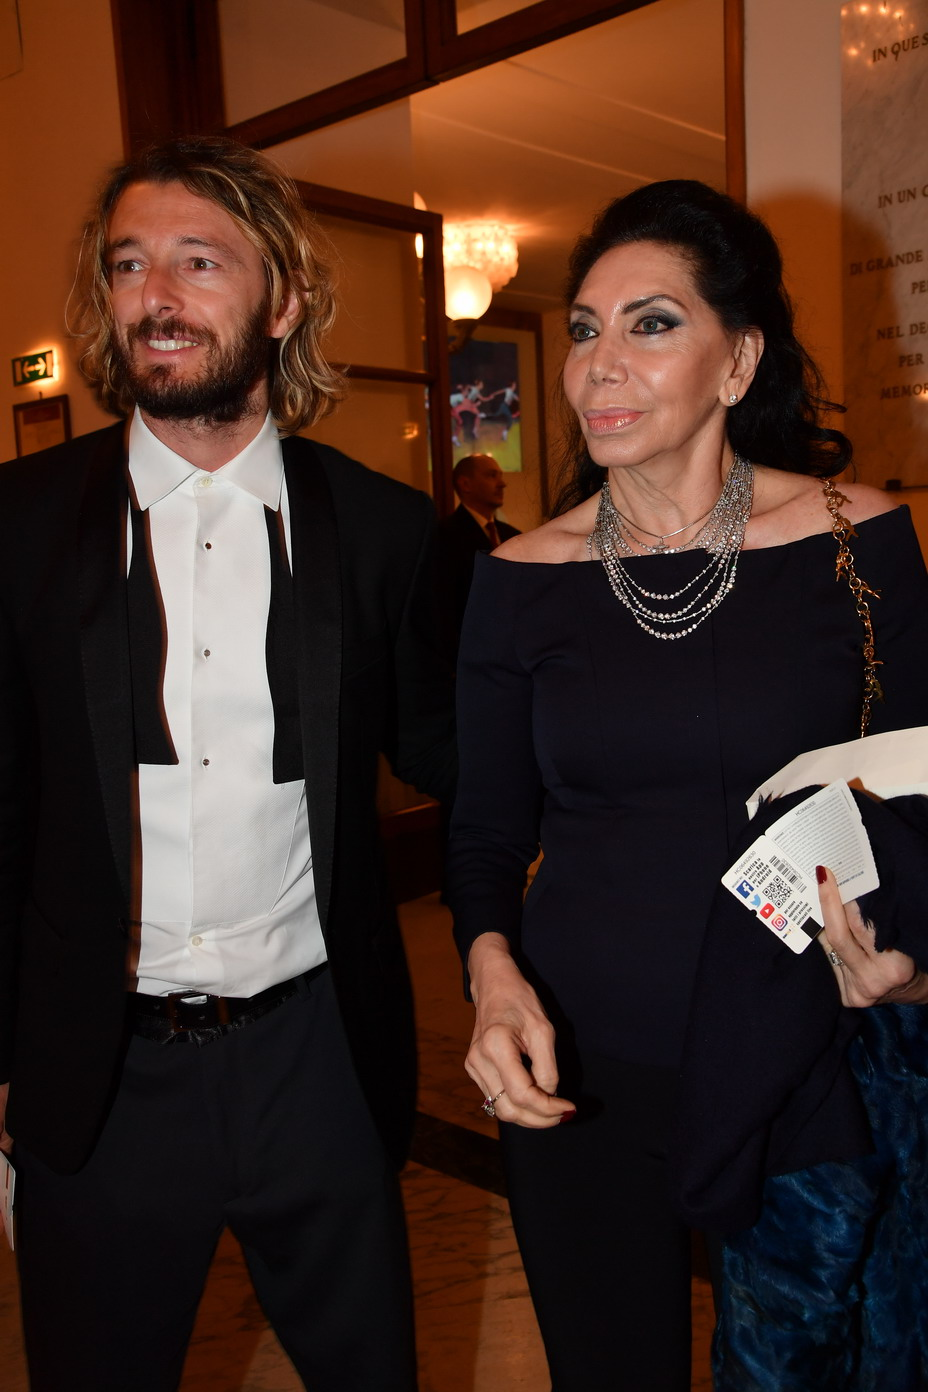 Federico Balzarini, Paola Mainetti